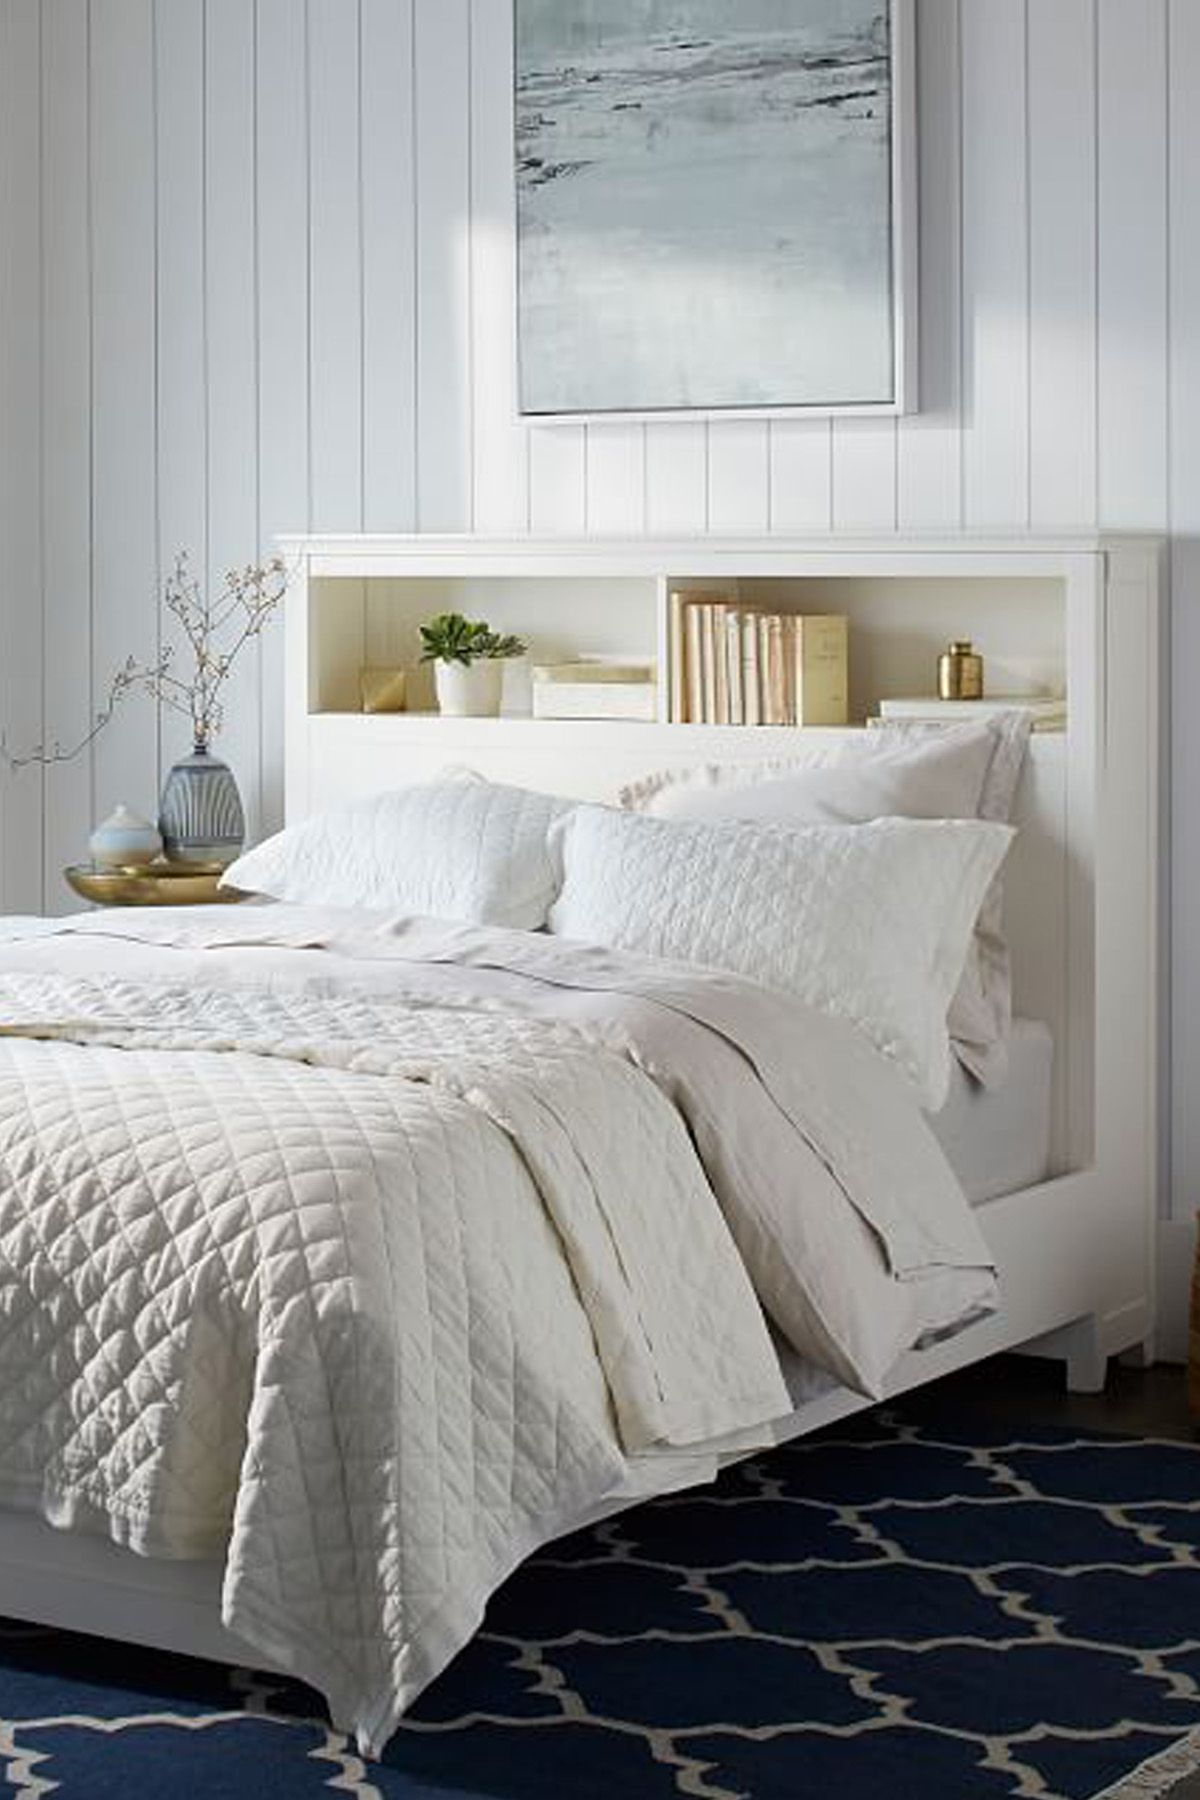 20 best headboard ideas unique designs for bed headboards rh housebeautiful com